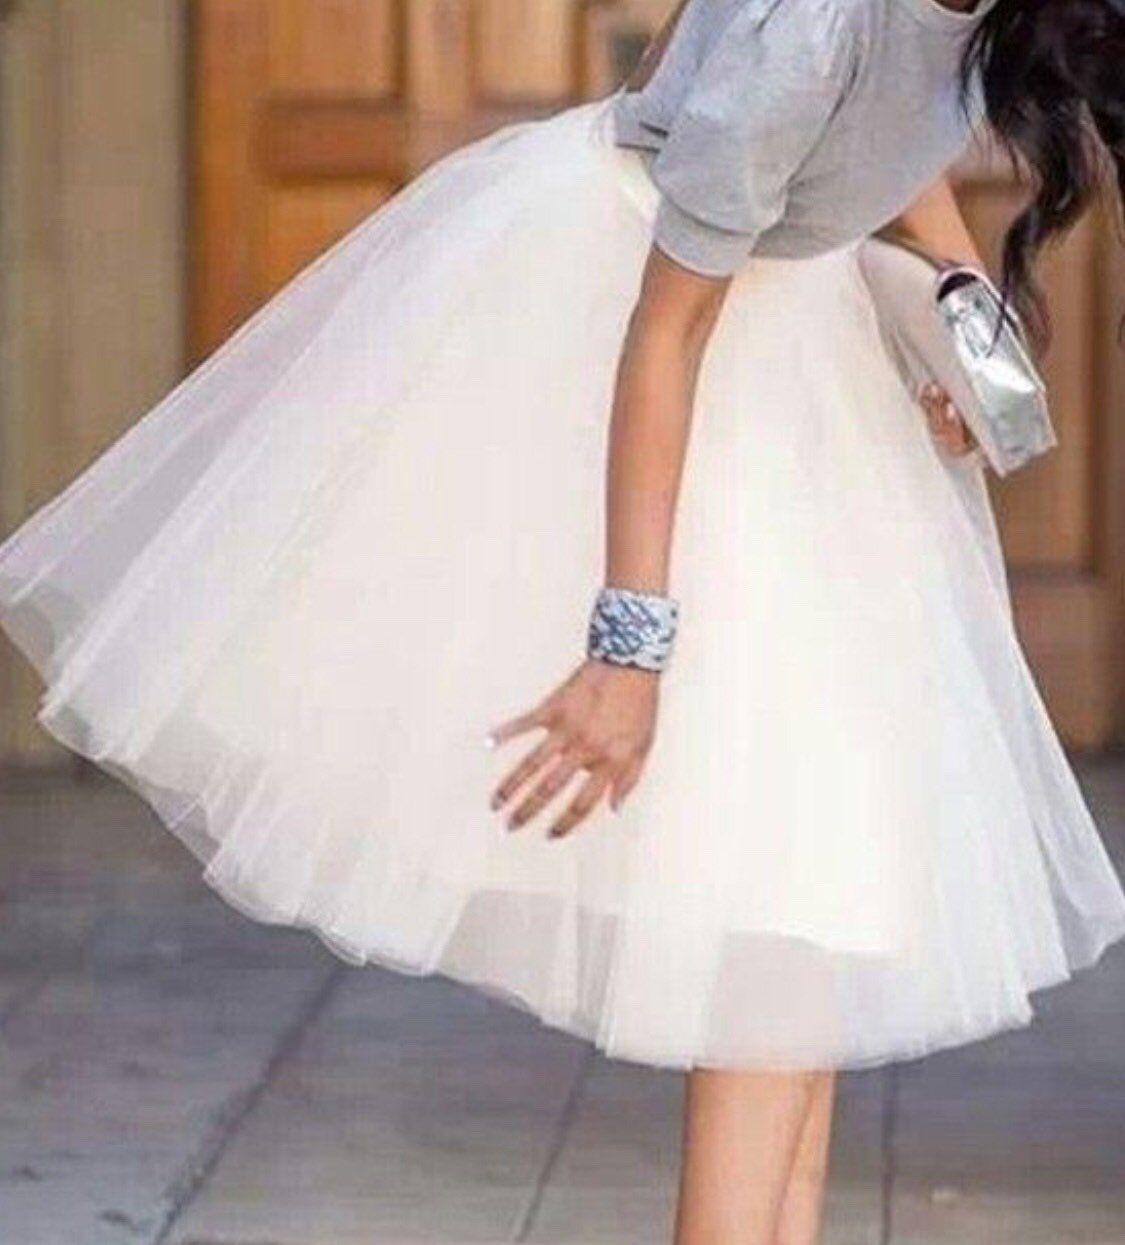 Ivory Tulle Skirt Bridesmaid Dress Wedding Tutu Womens Custom Etsy Ivory Tulle Skirt Blush Tulle Skirt Bridesmaid Dresses [ 1245 x 1125 Pixel ]